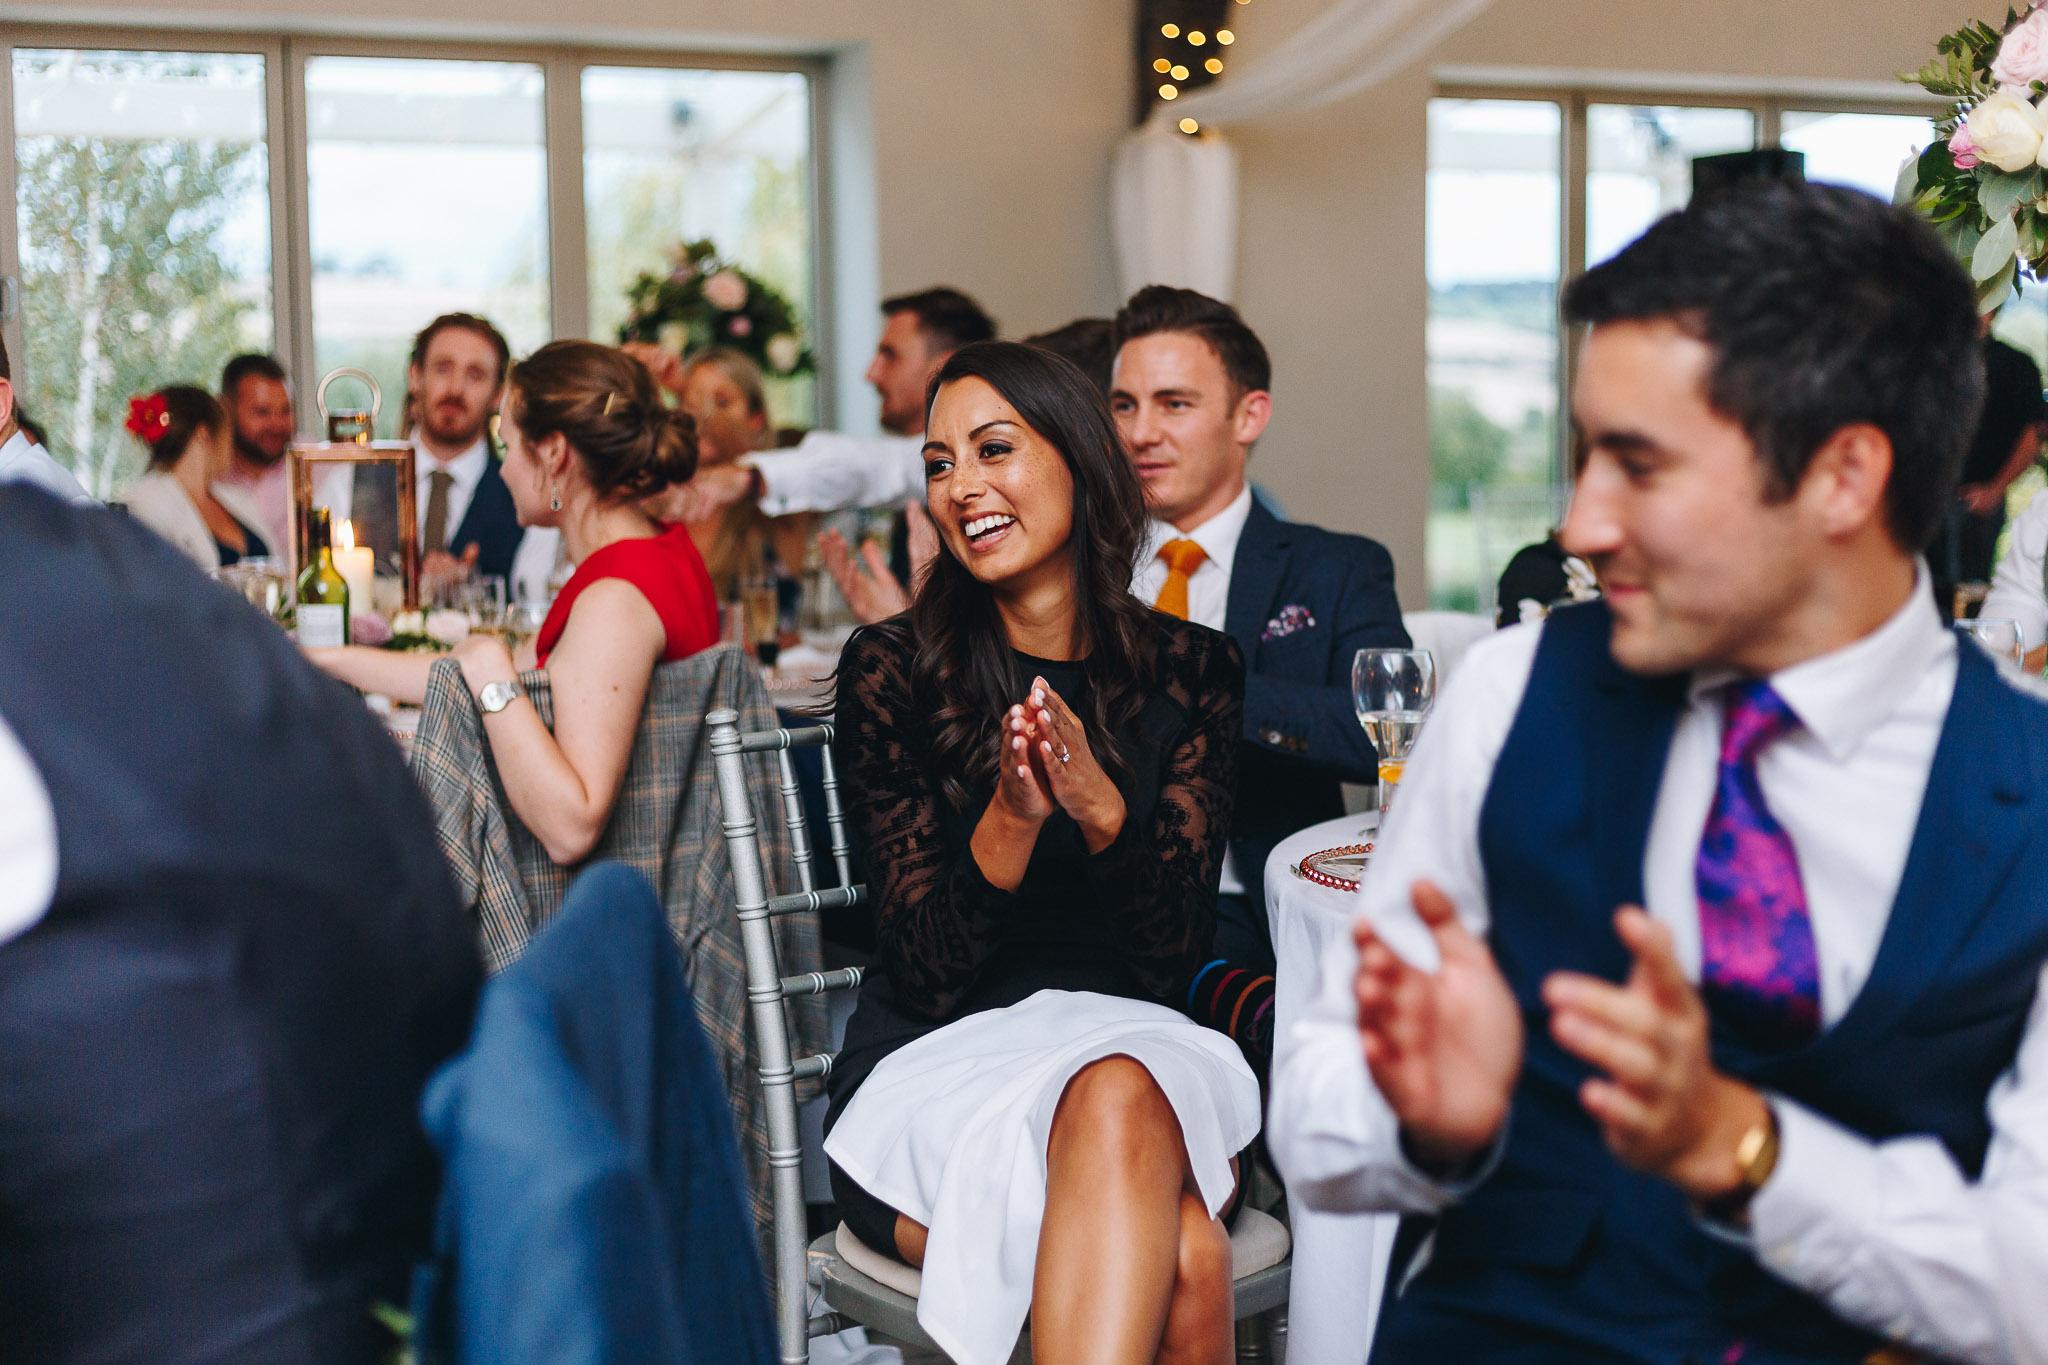 Andy Matheson Wedding Photographer West Yorkshire_111.jpg